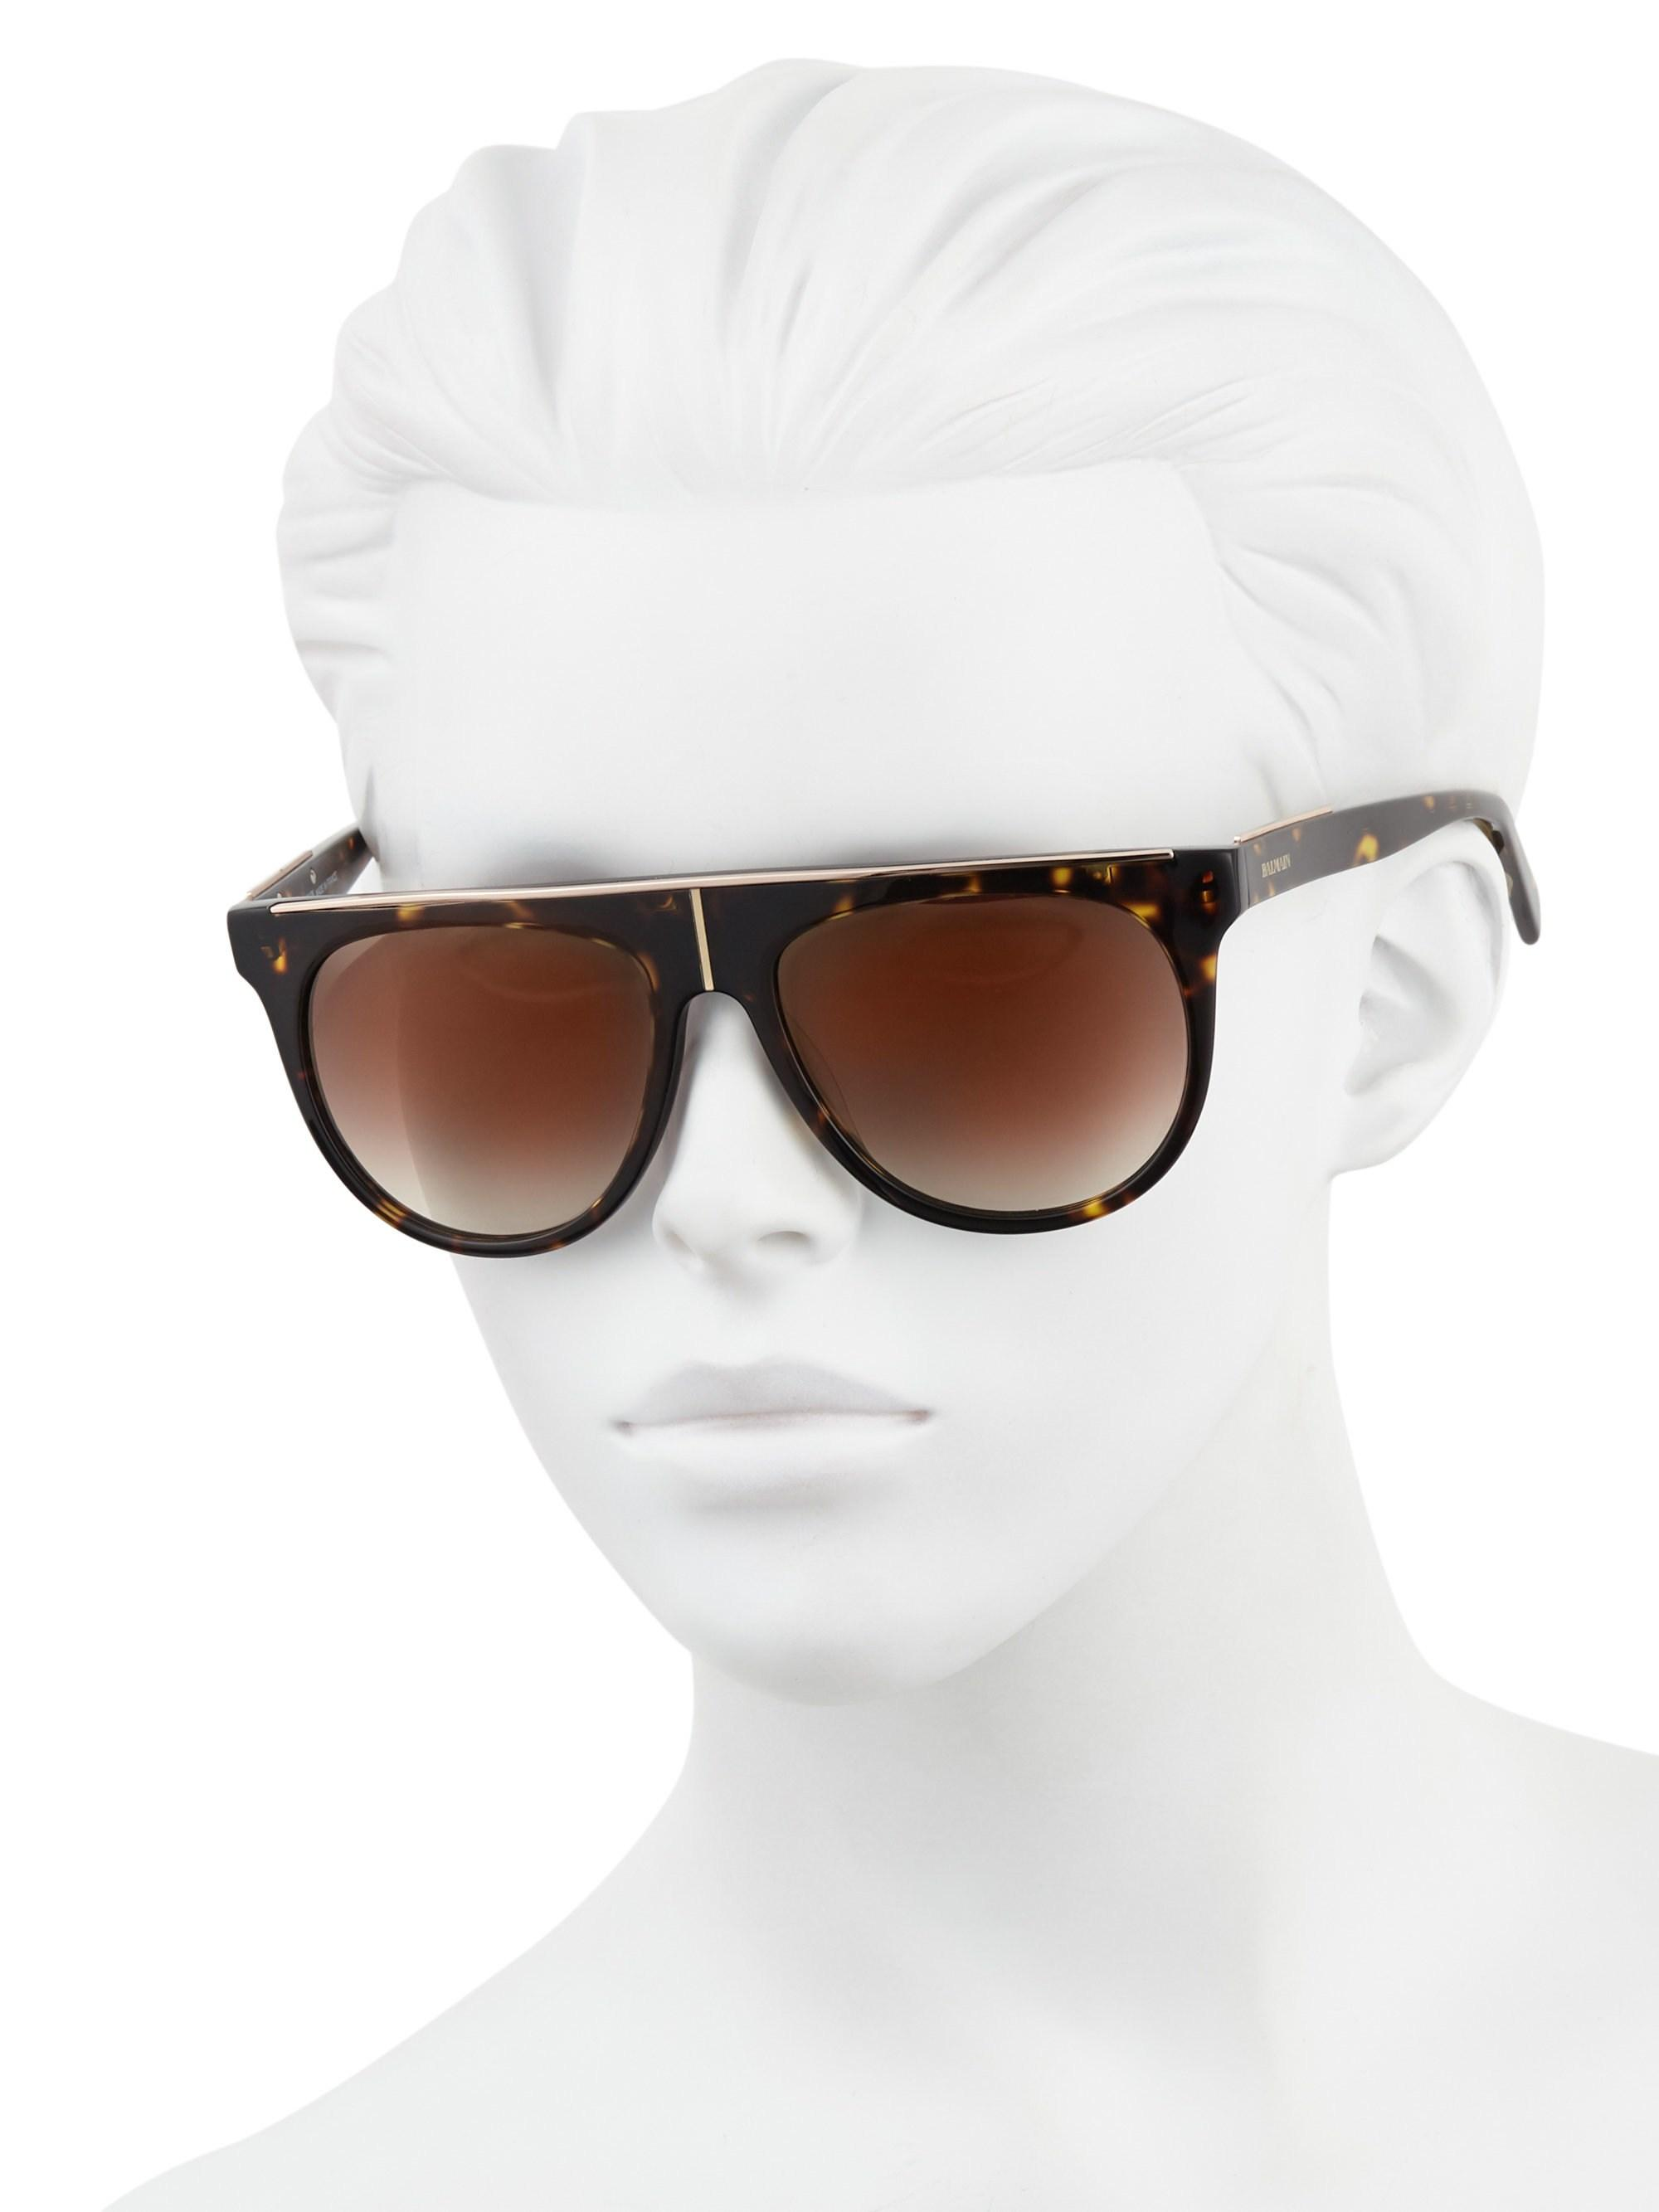 7d4c172ee3a Lyst - Balmain 55mm Flat-top Sunglasses in Brown